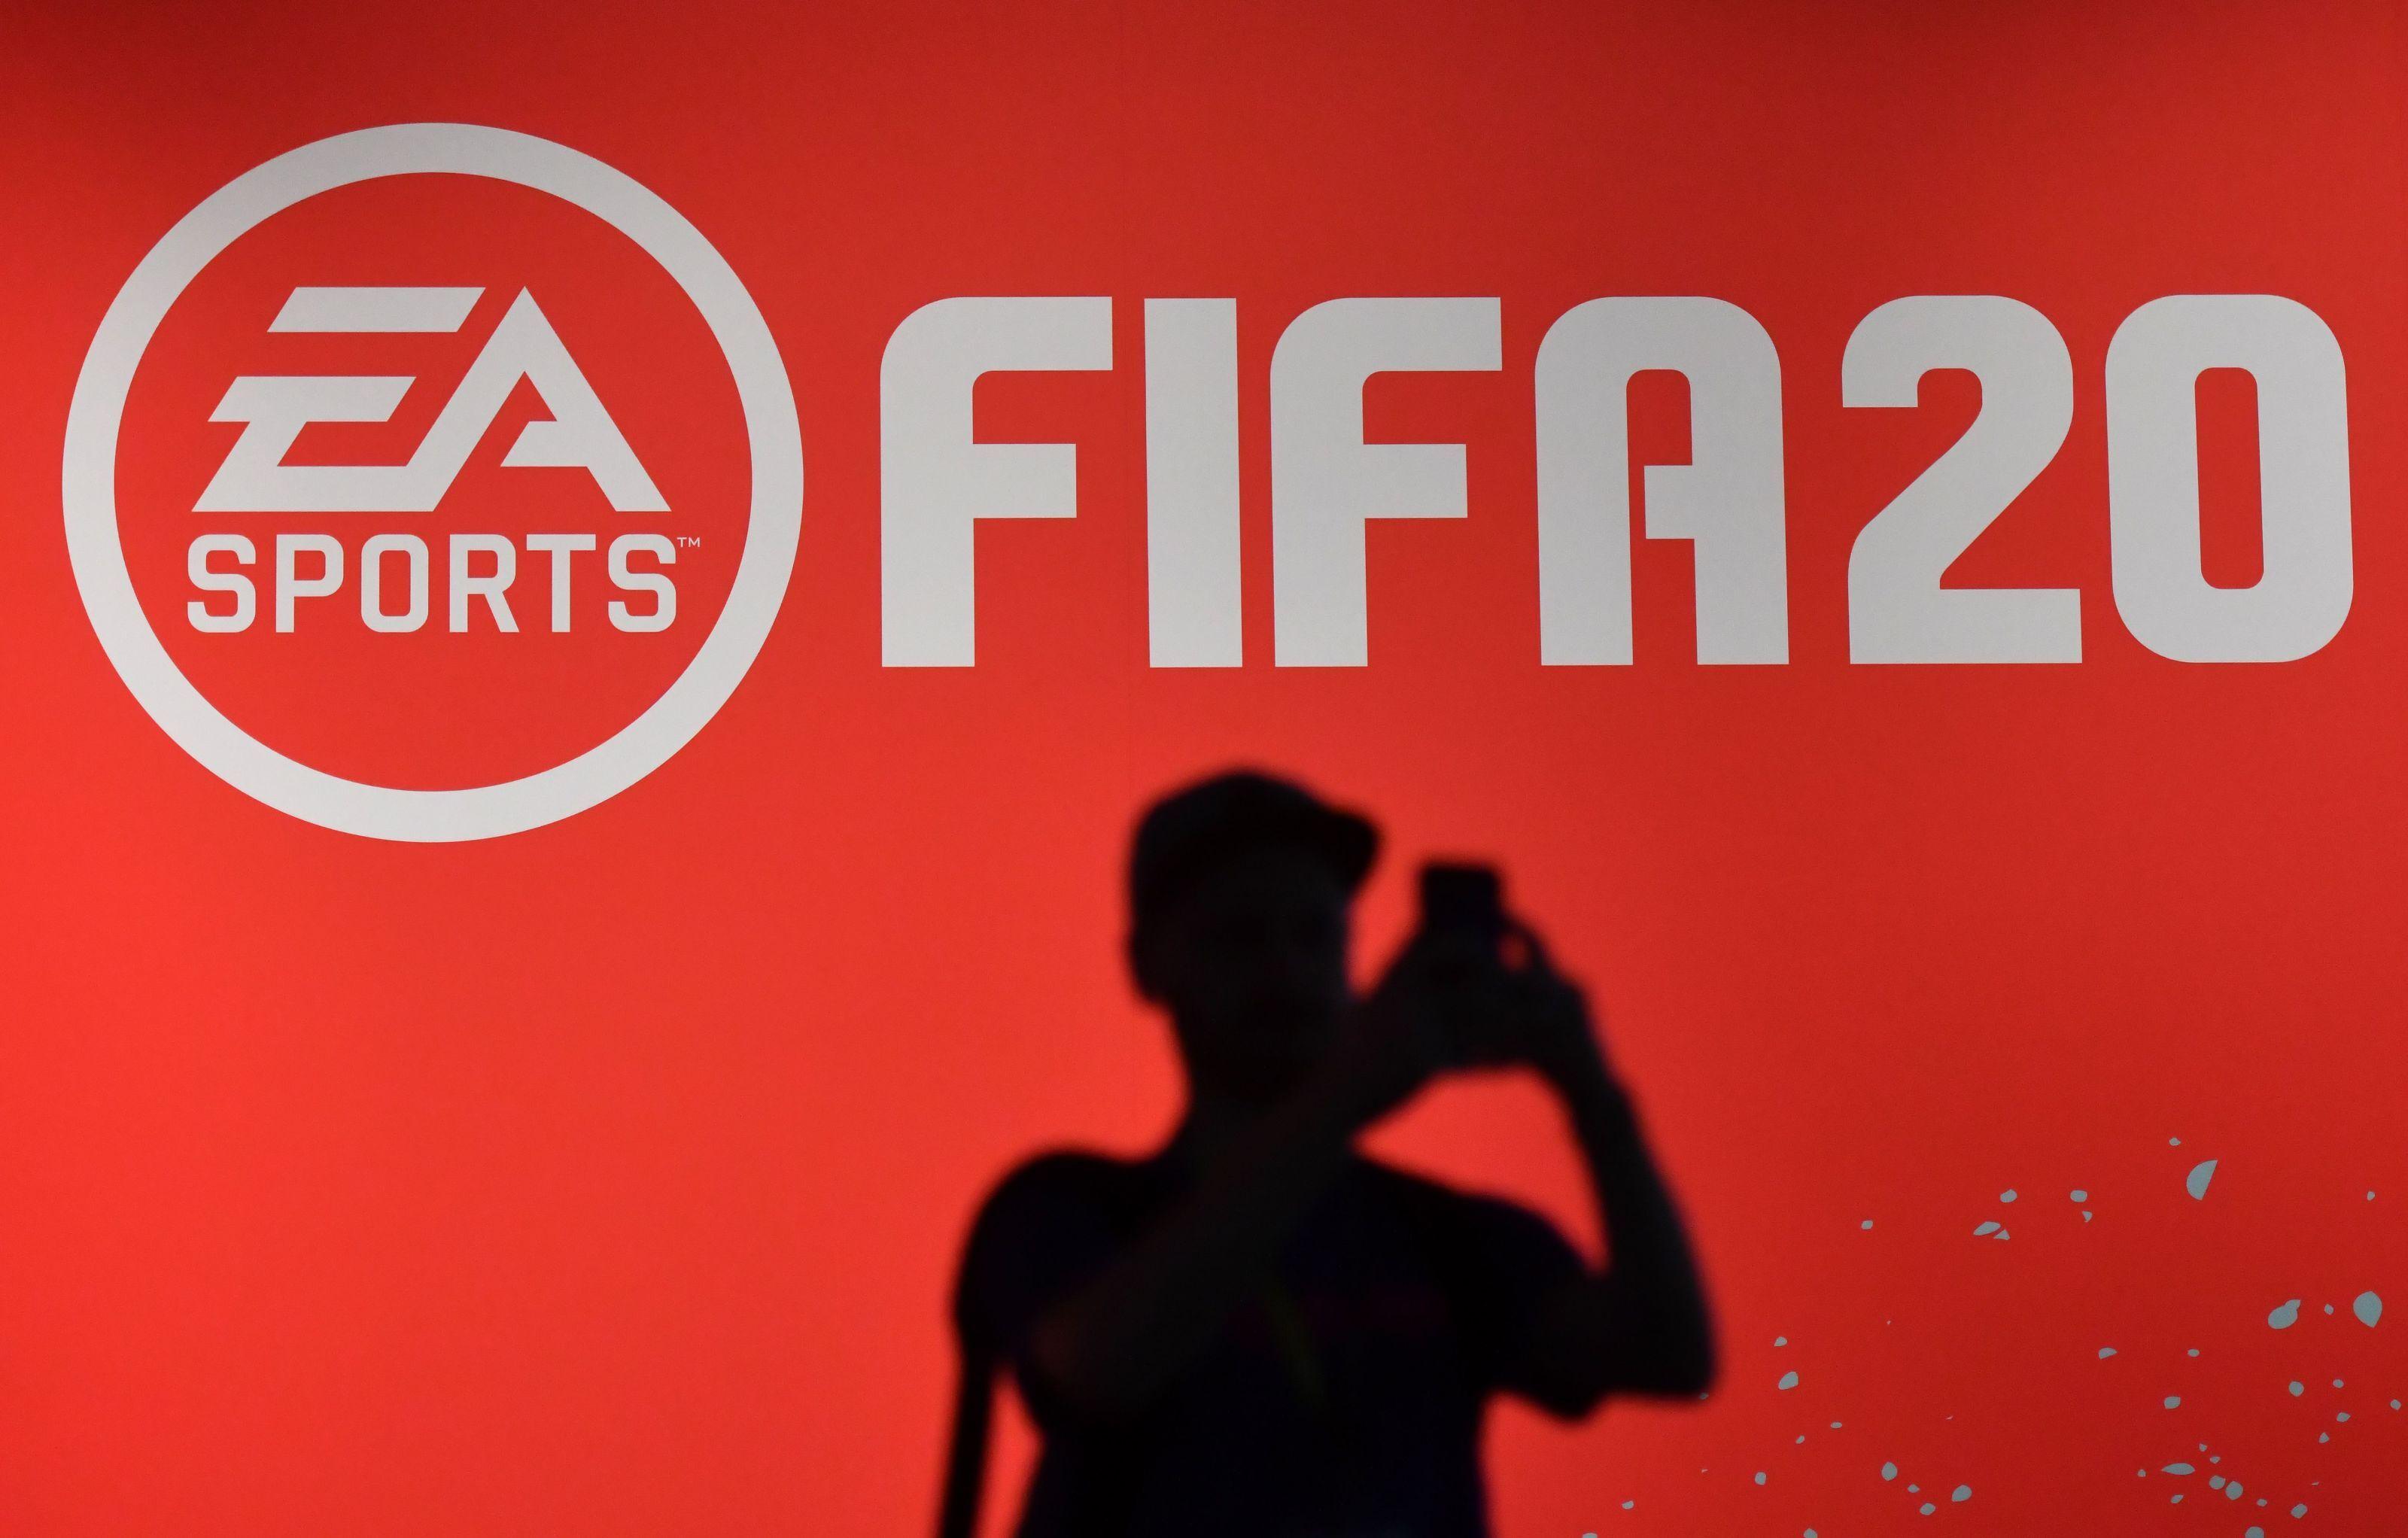 10 Barcelona players in FIFA 20 Top 100, 3 major downgrades